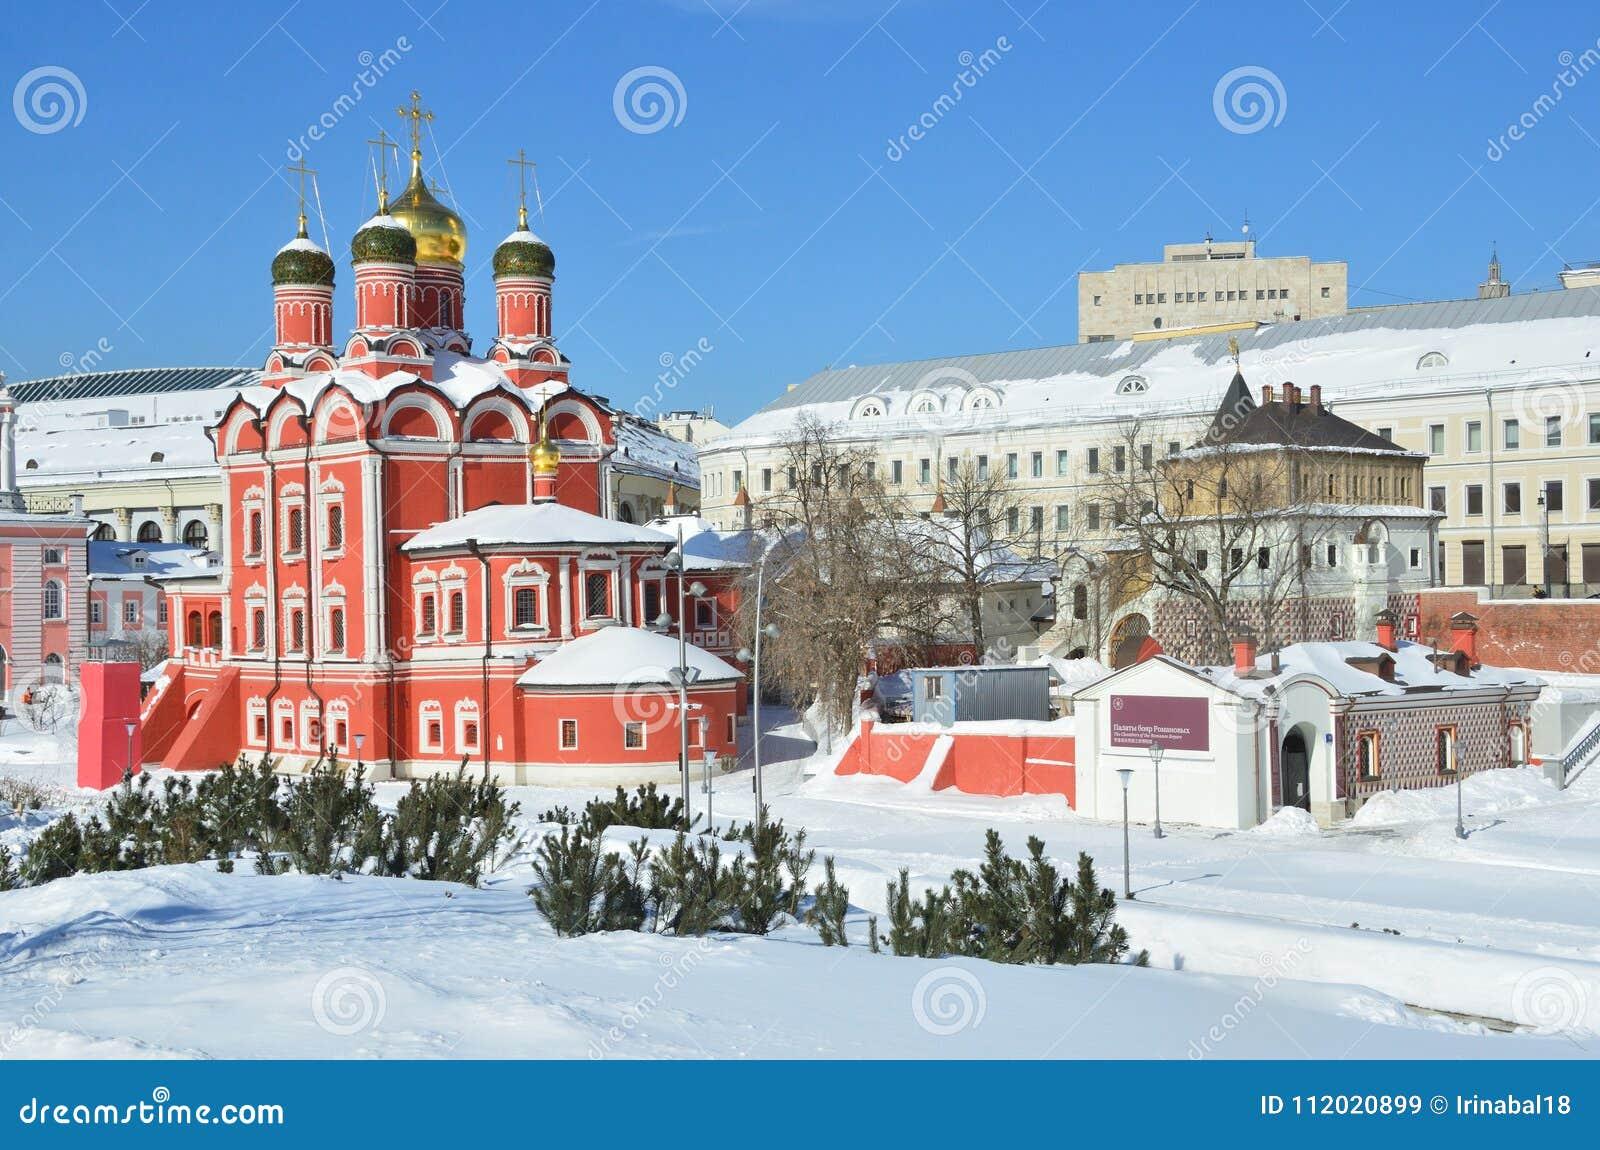 Noscow, Russia, March, 06, 2018. Znamensky monastery and Chambers of Romanov boyars in sunny spring day on Varvarka street